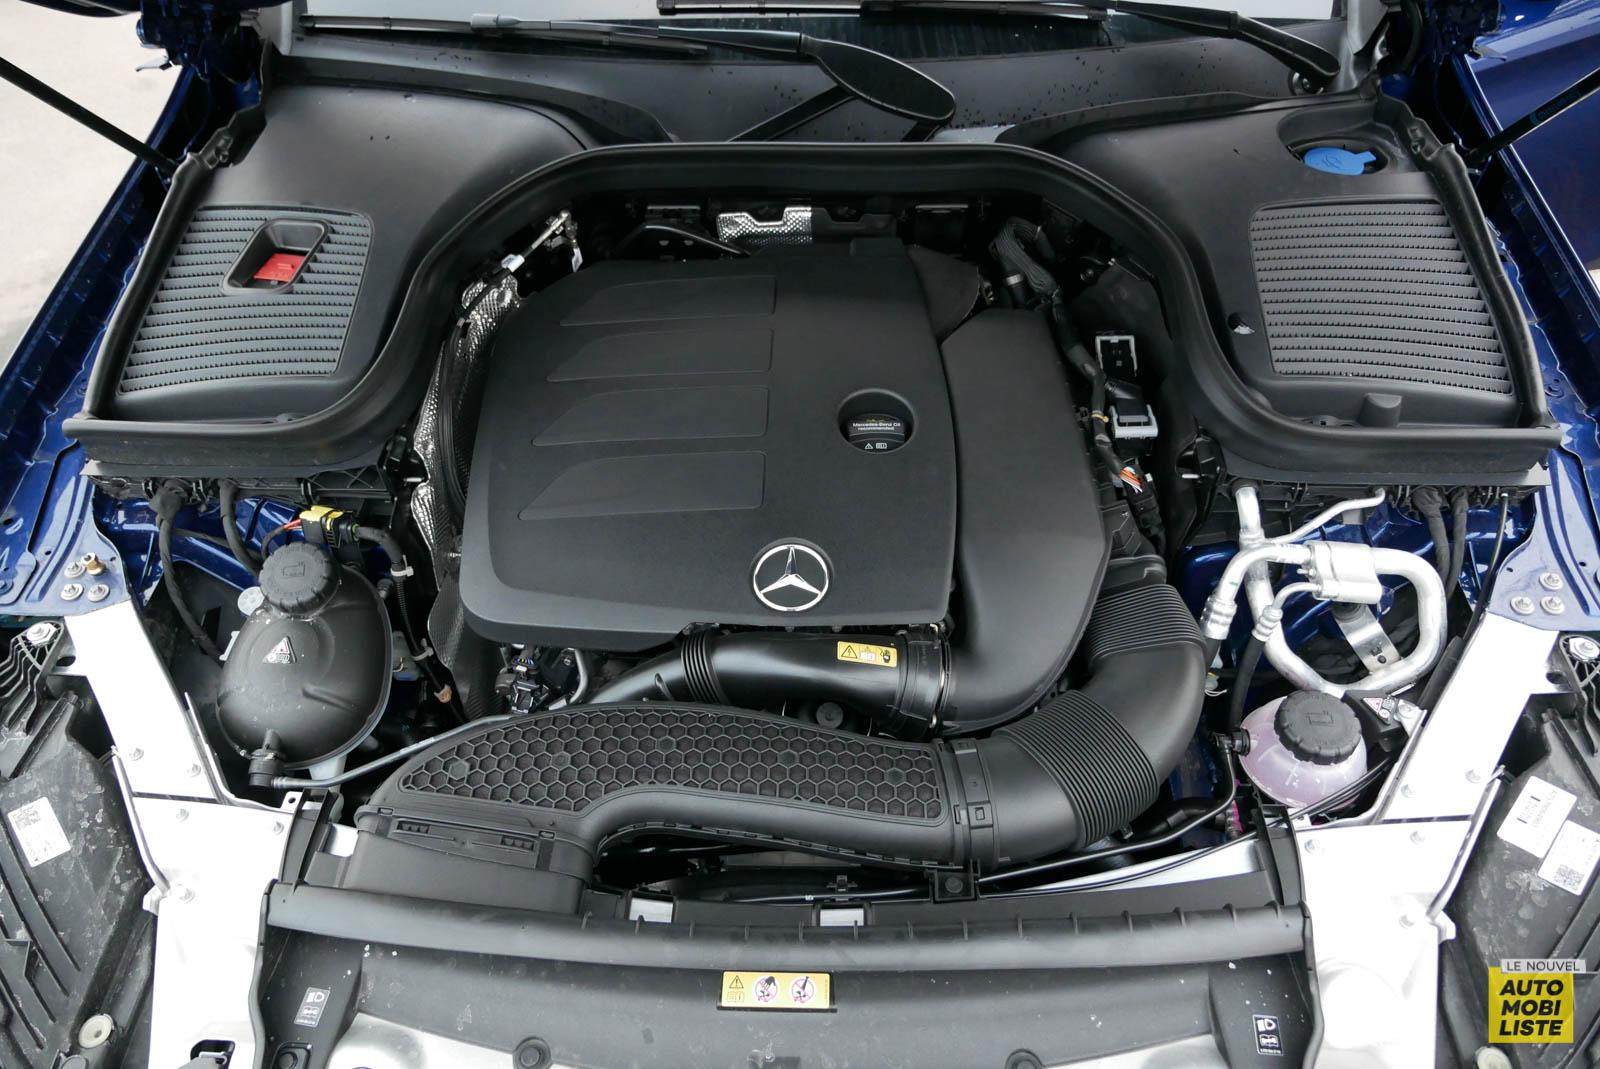 LNA Essai 2001 Mercedes Benz GLC Coupe Moteur